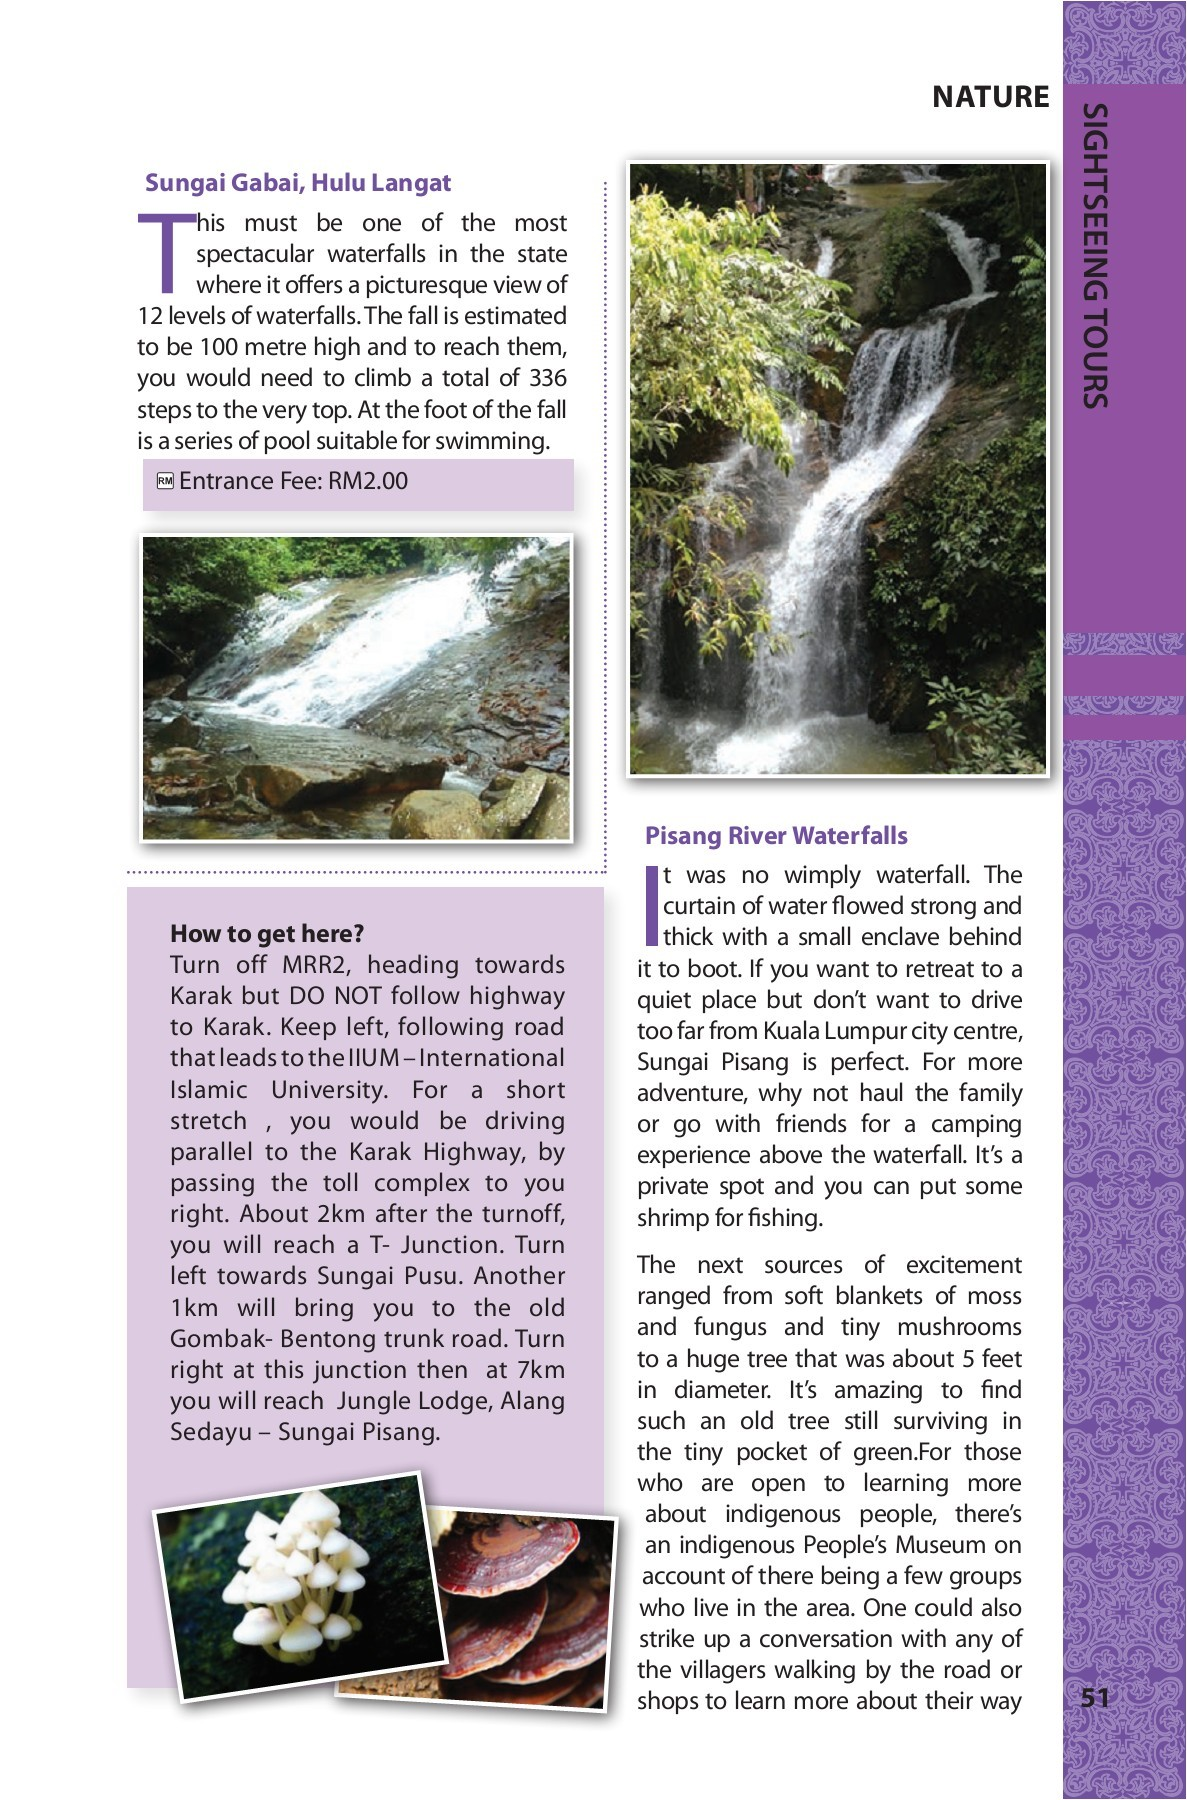 Ciri Ciri Lagu Rock : KV4L15, Pages, 51-100, PubHTML5